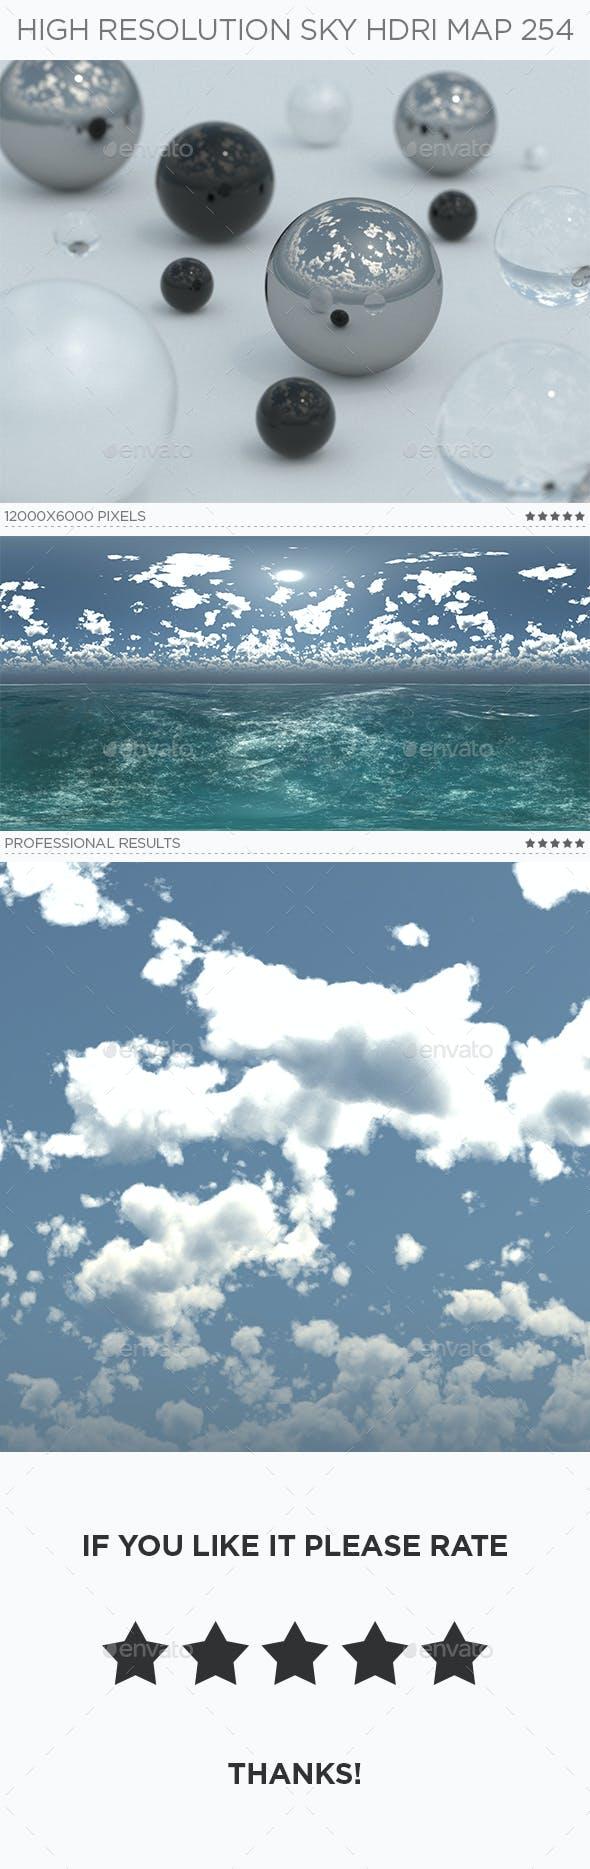 High Resolution Sky HDRi Map 254 - 3DOcean Item for Sale